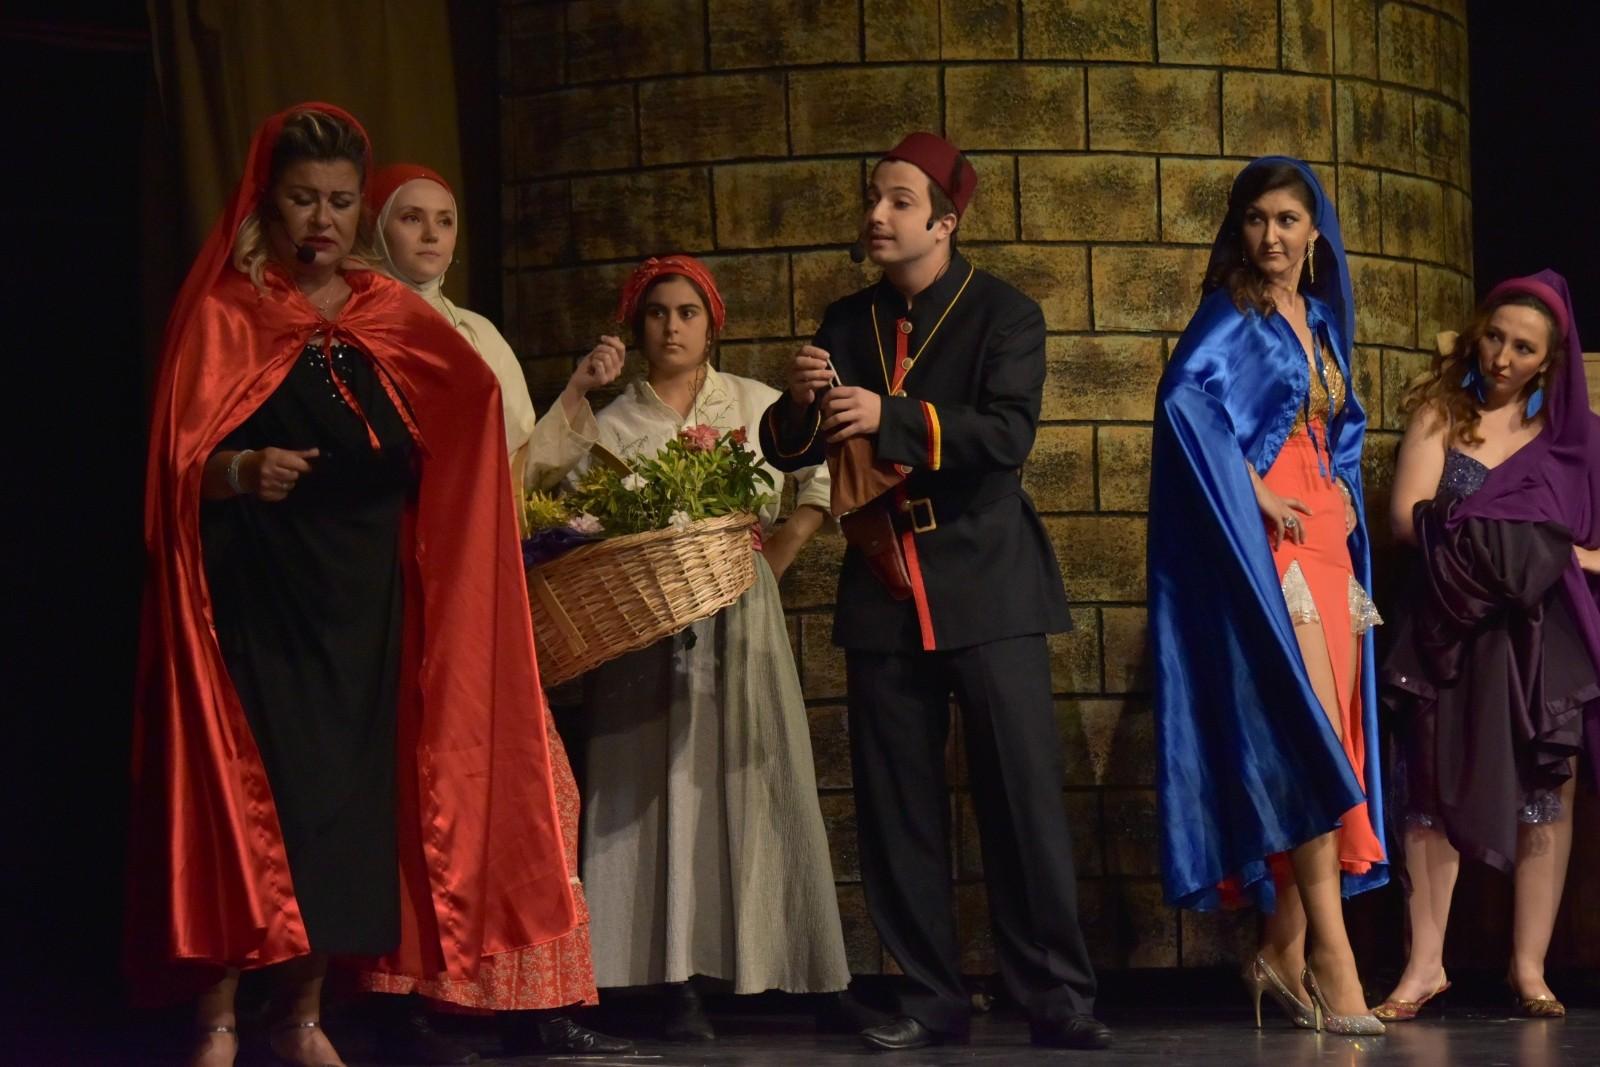 Şekerpare müzikali Aliağa'da sahnelendi